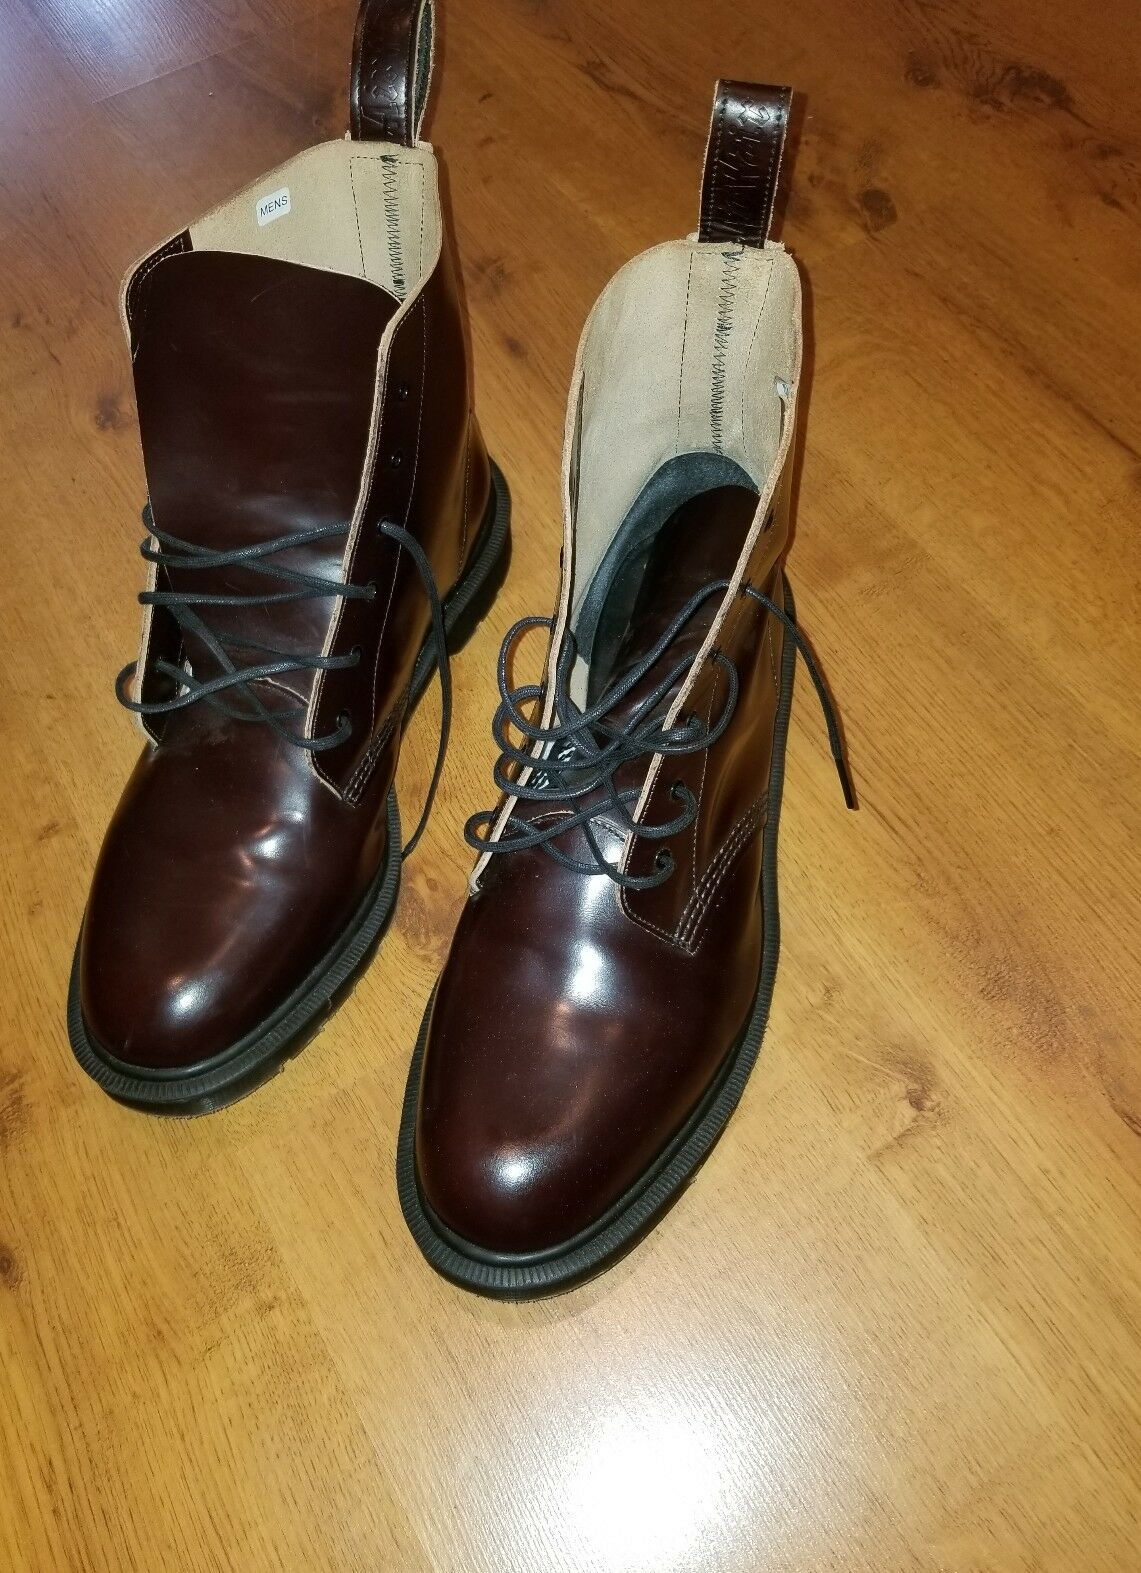 Dr Martens Mens Arthur Boanil Brush Leather MIE Boots Sz 13 US 12 UK